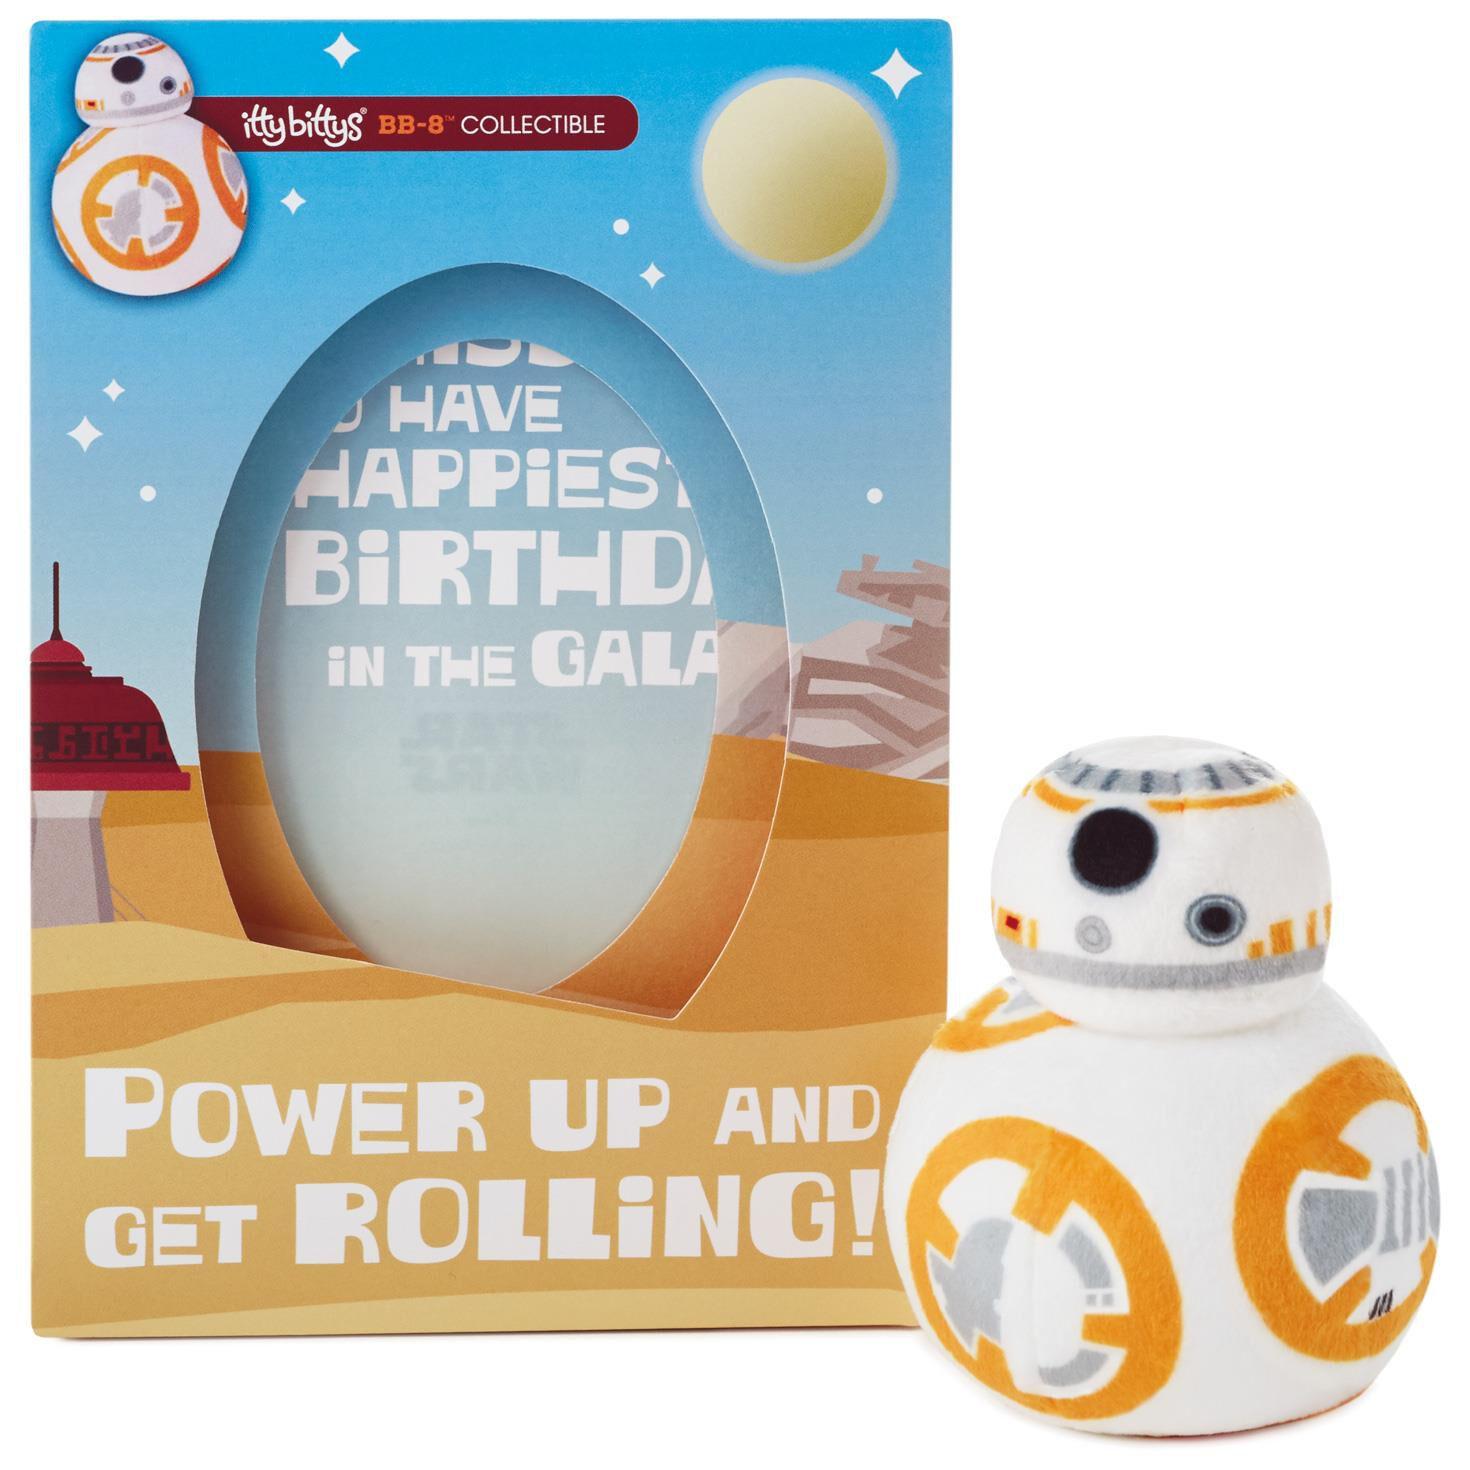 itty bittysstar wars™ bb 8™ birthday card with stuffed animal